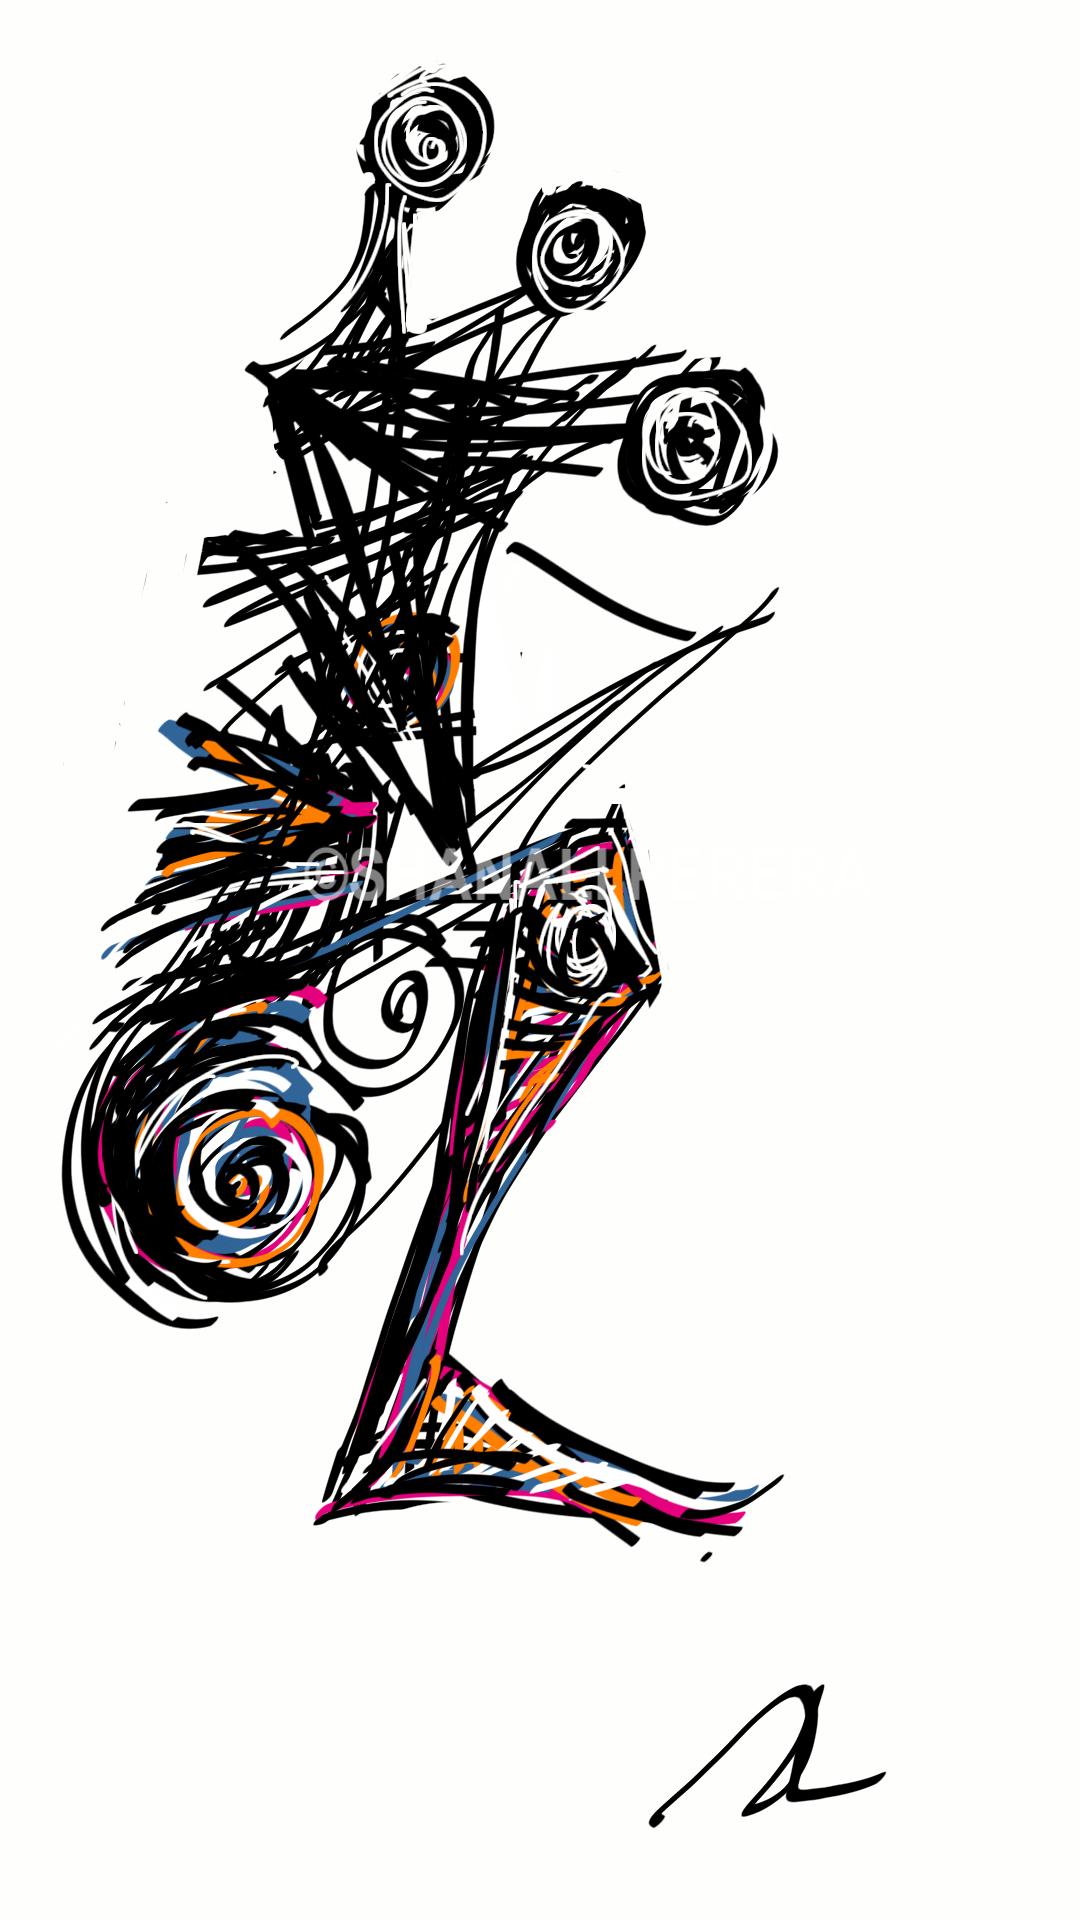 sketch-1508773503269.png